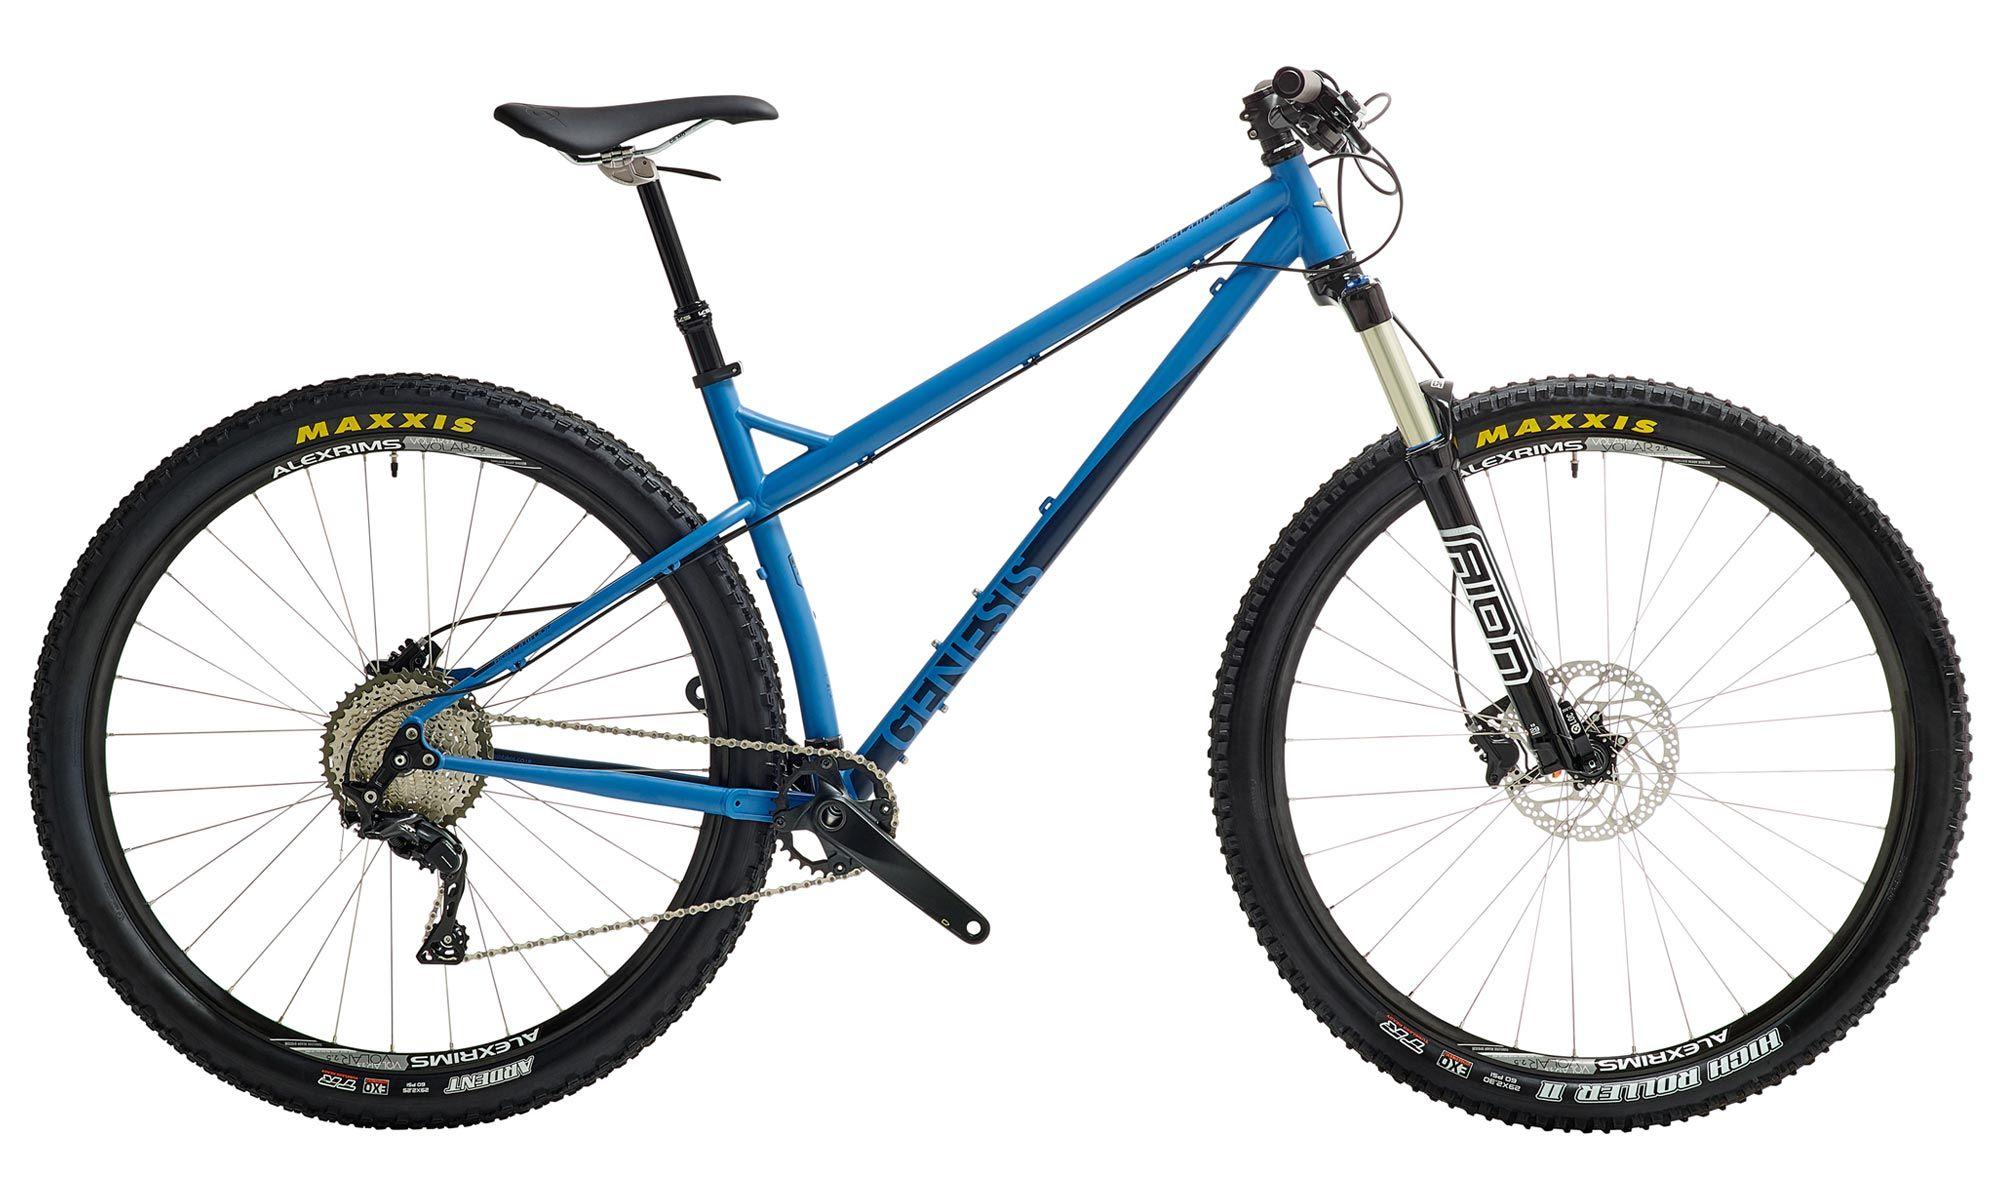 2016 Genesis High Latitude Steel Hardtail Mountain Bike Bike